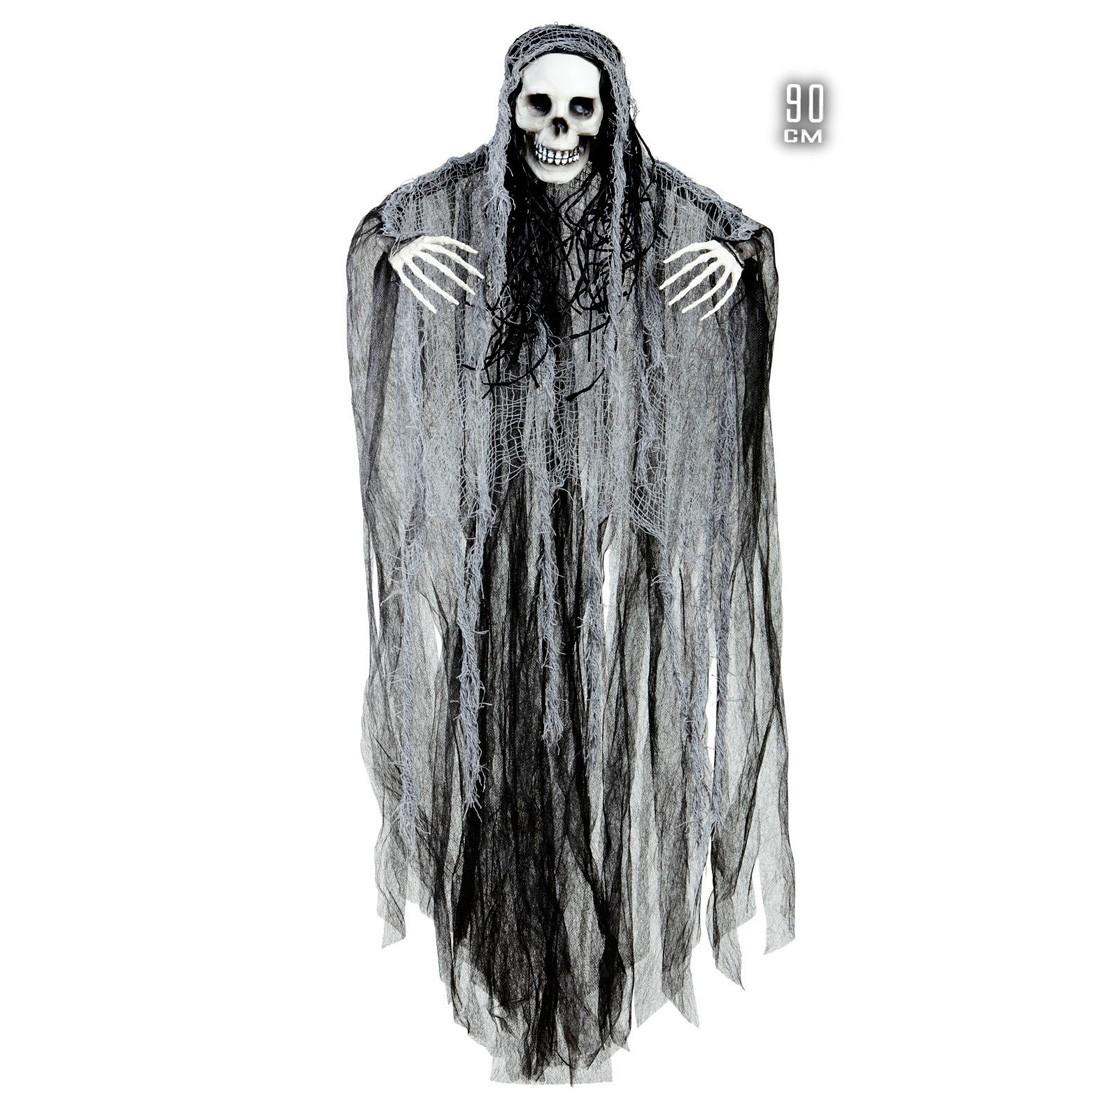 grim reaper deko halloween skelett zum aufh ngen 90 cm sensenmann deko h ngedekoration totenkopf. Black Bedroom Furniture Sets. Home Design Ideas